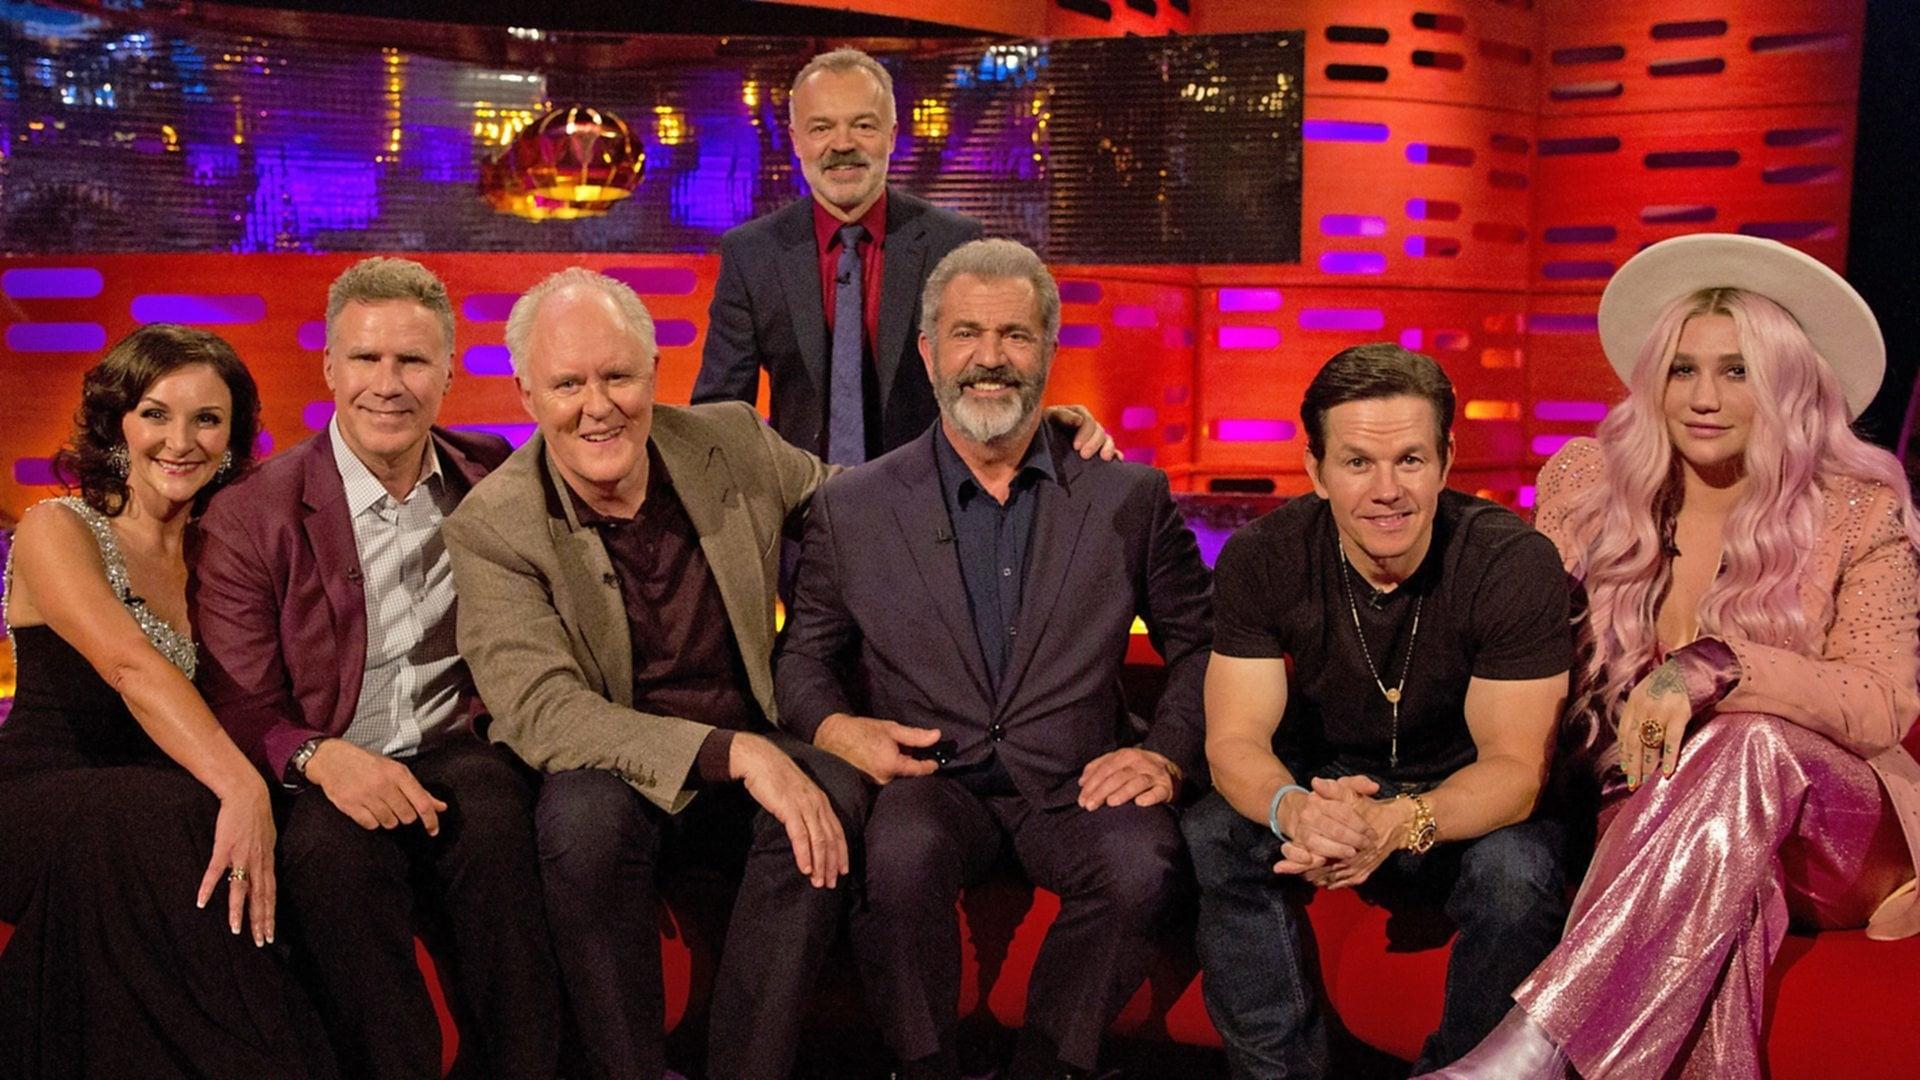 The Graham Norton Show - Season 22 Episode 8 : Mel Gibson, Will Ferrell, Mark Wahlberg, John Lithgow, Kesha